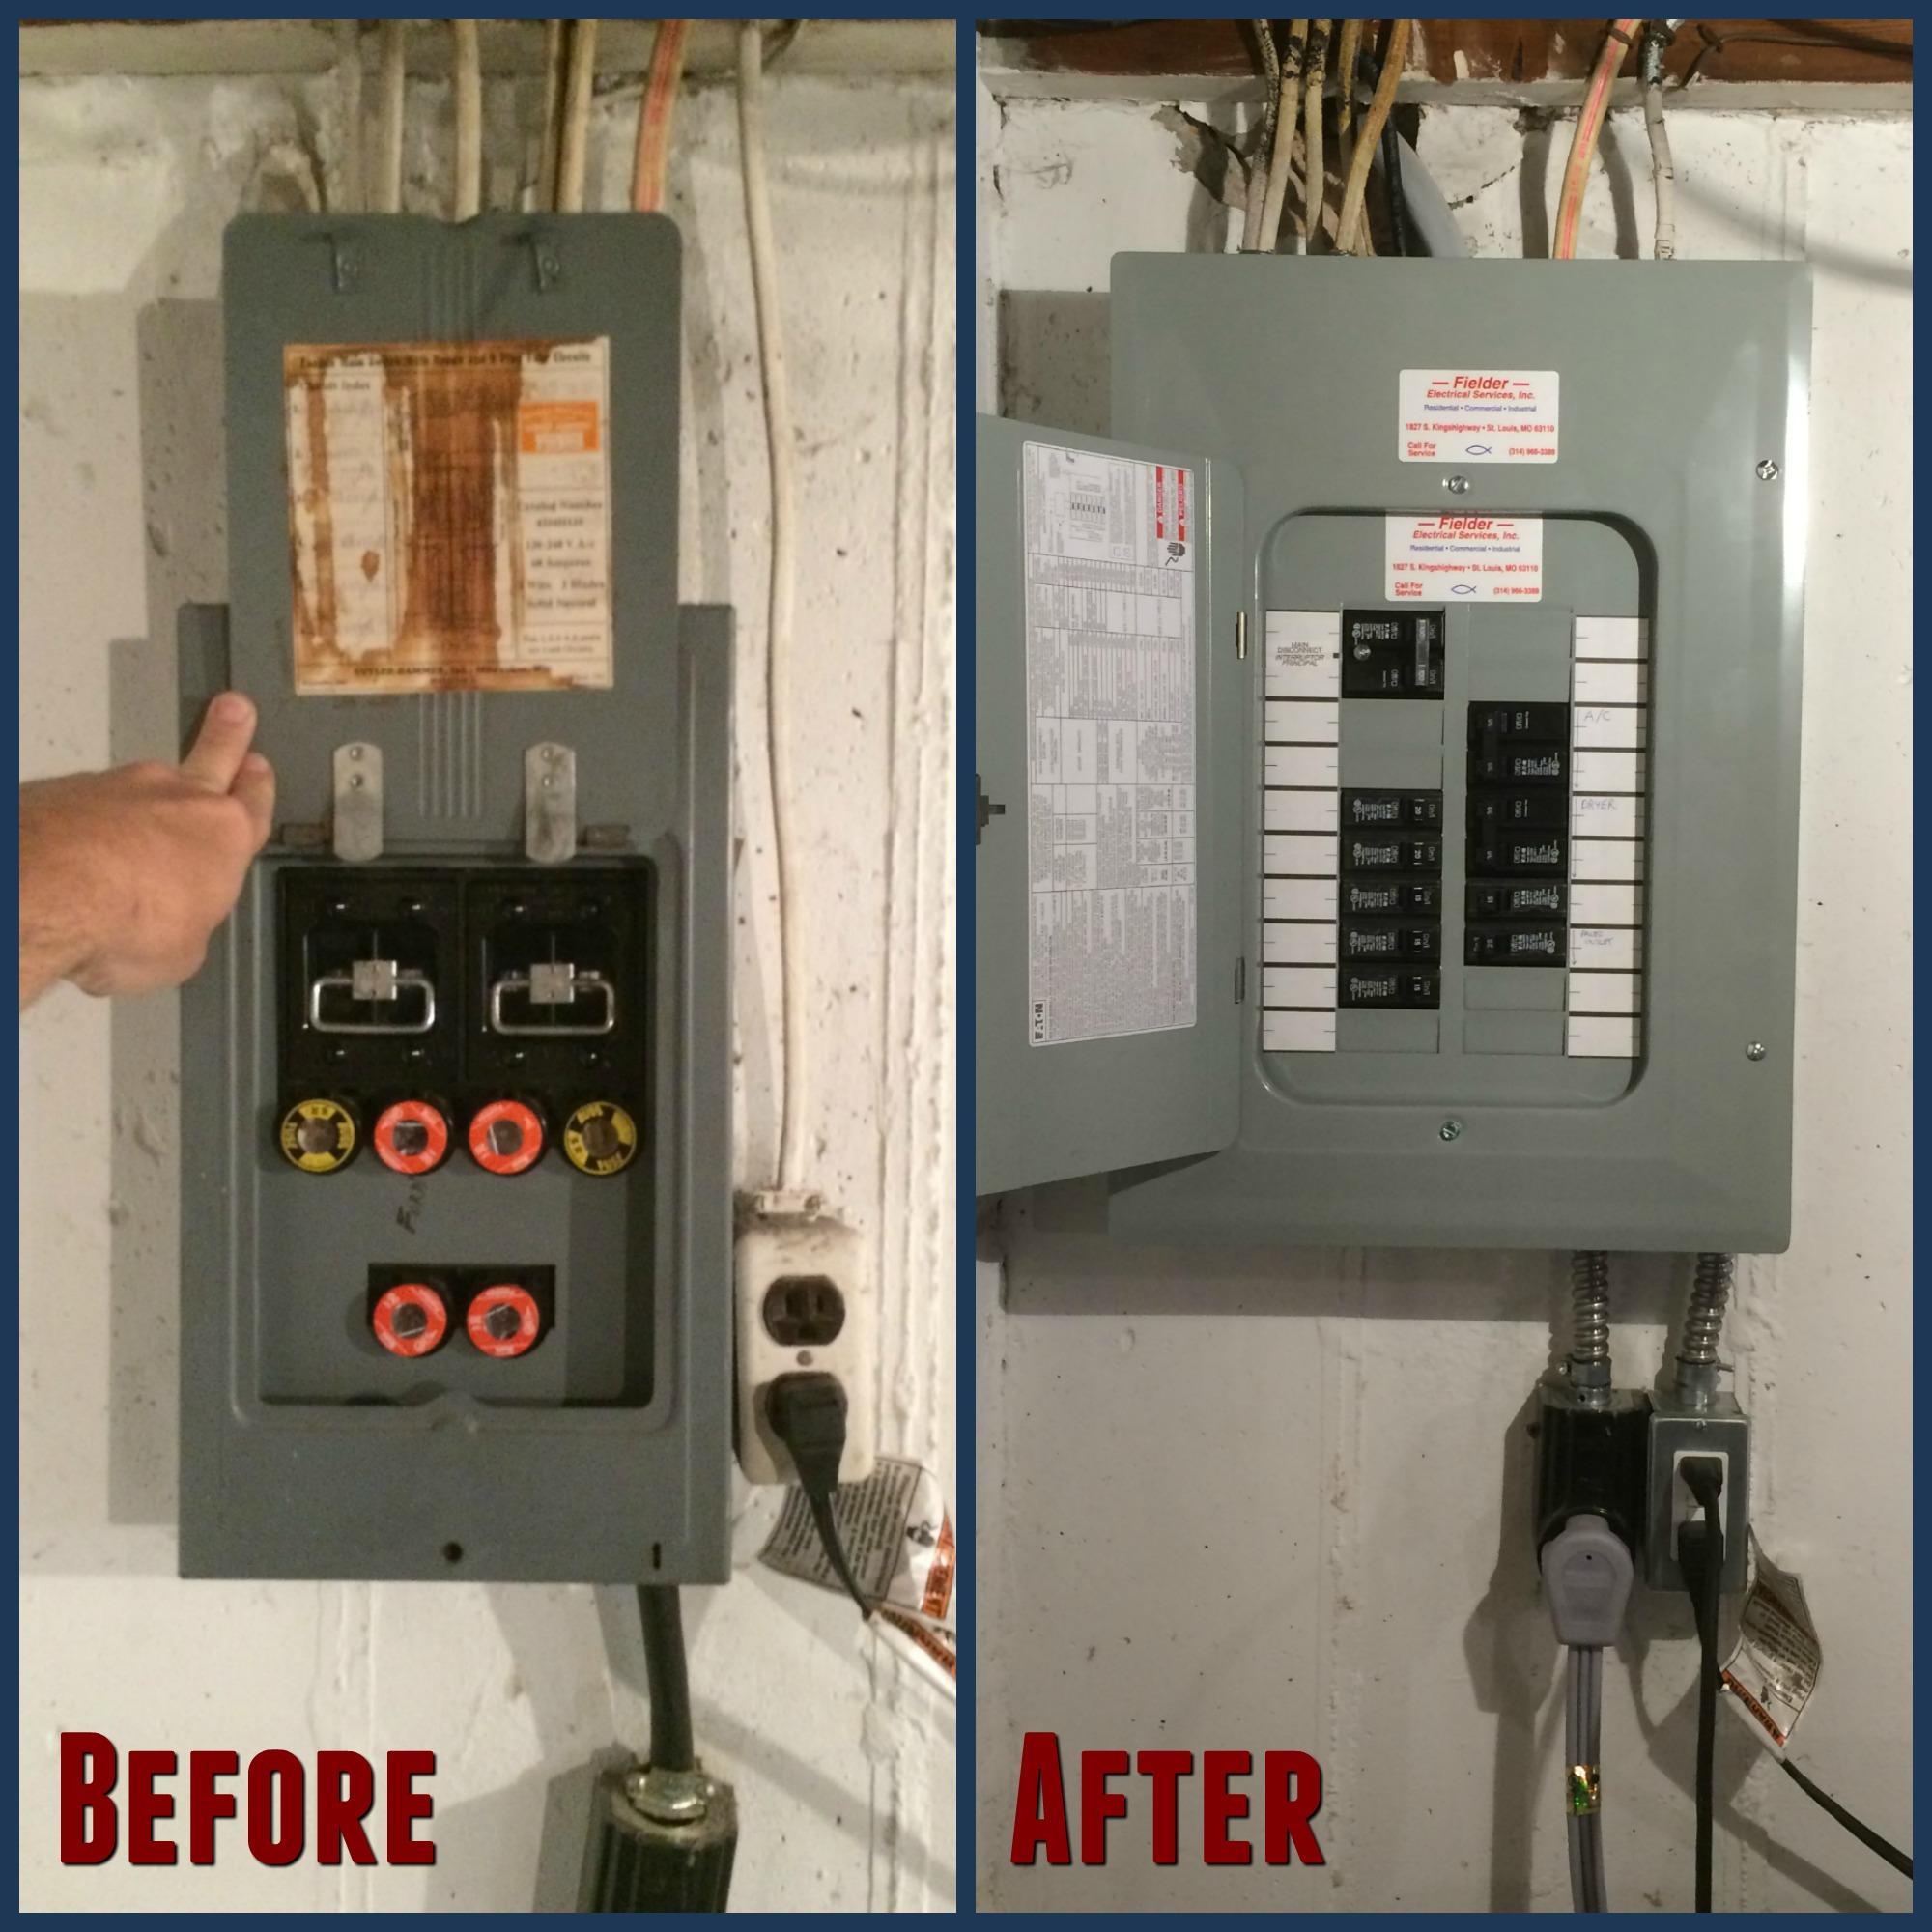 60 amp fuse panel circuit diagram symbols u2022 rh stripgore com Home Fuse Box Home Fuse Box